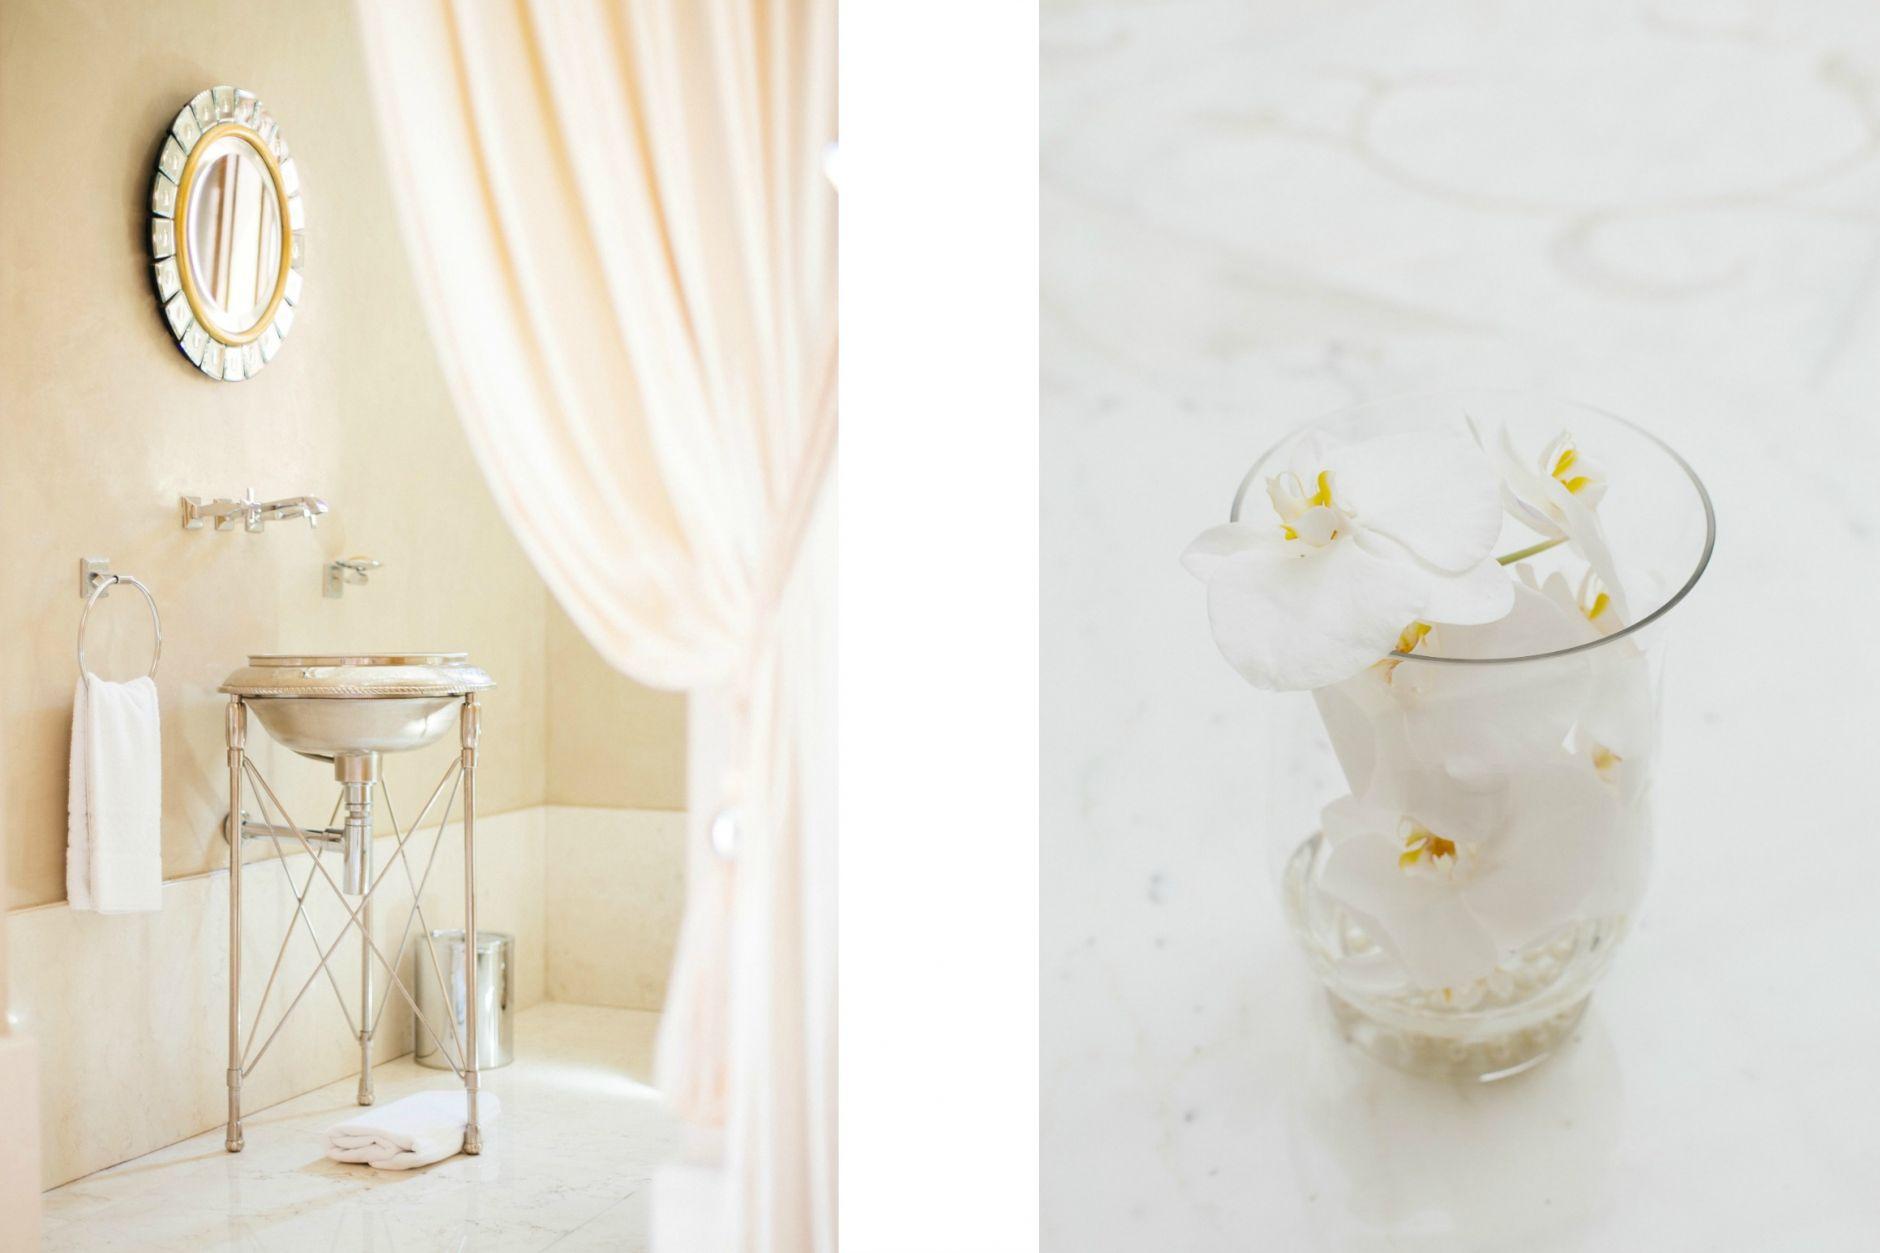 royal-mansour-hotel-luxury-marrakesch-marrakesh-morocco-edisa-shahini-disicouture-blog-duo-10